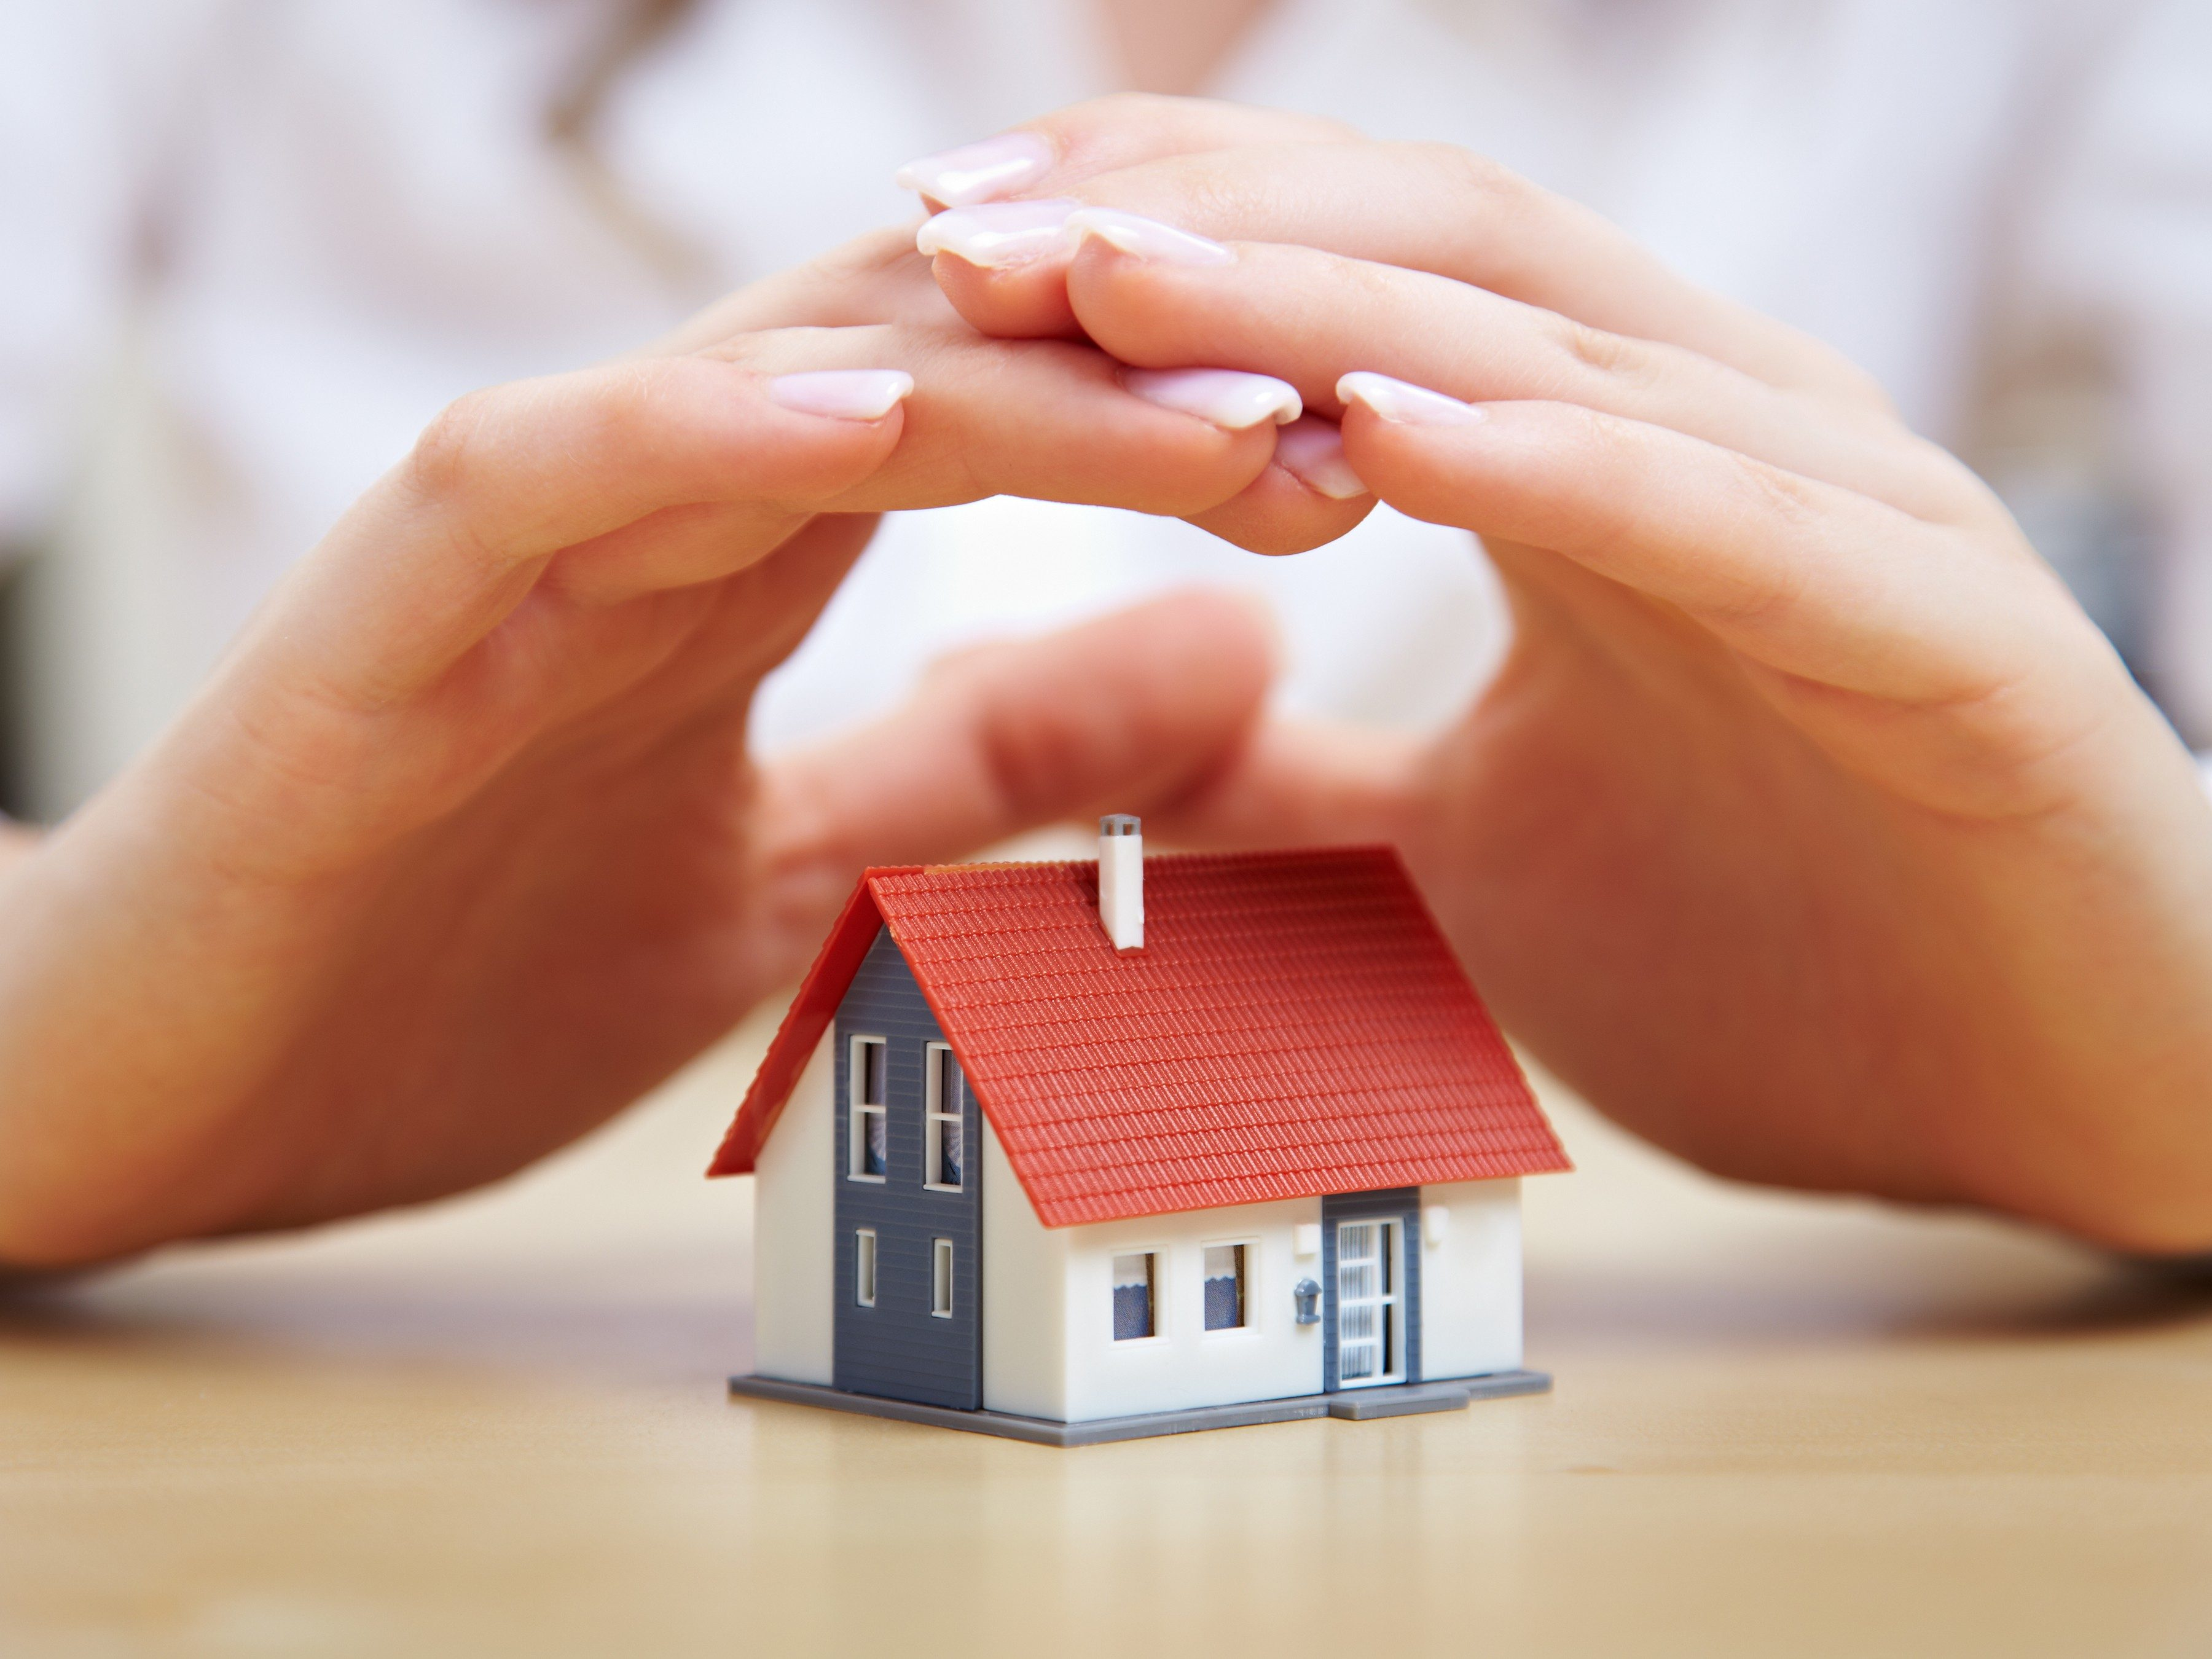 2. Seek insurance advice before listing on Airbnb.